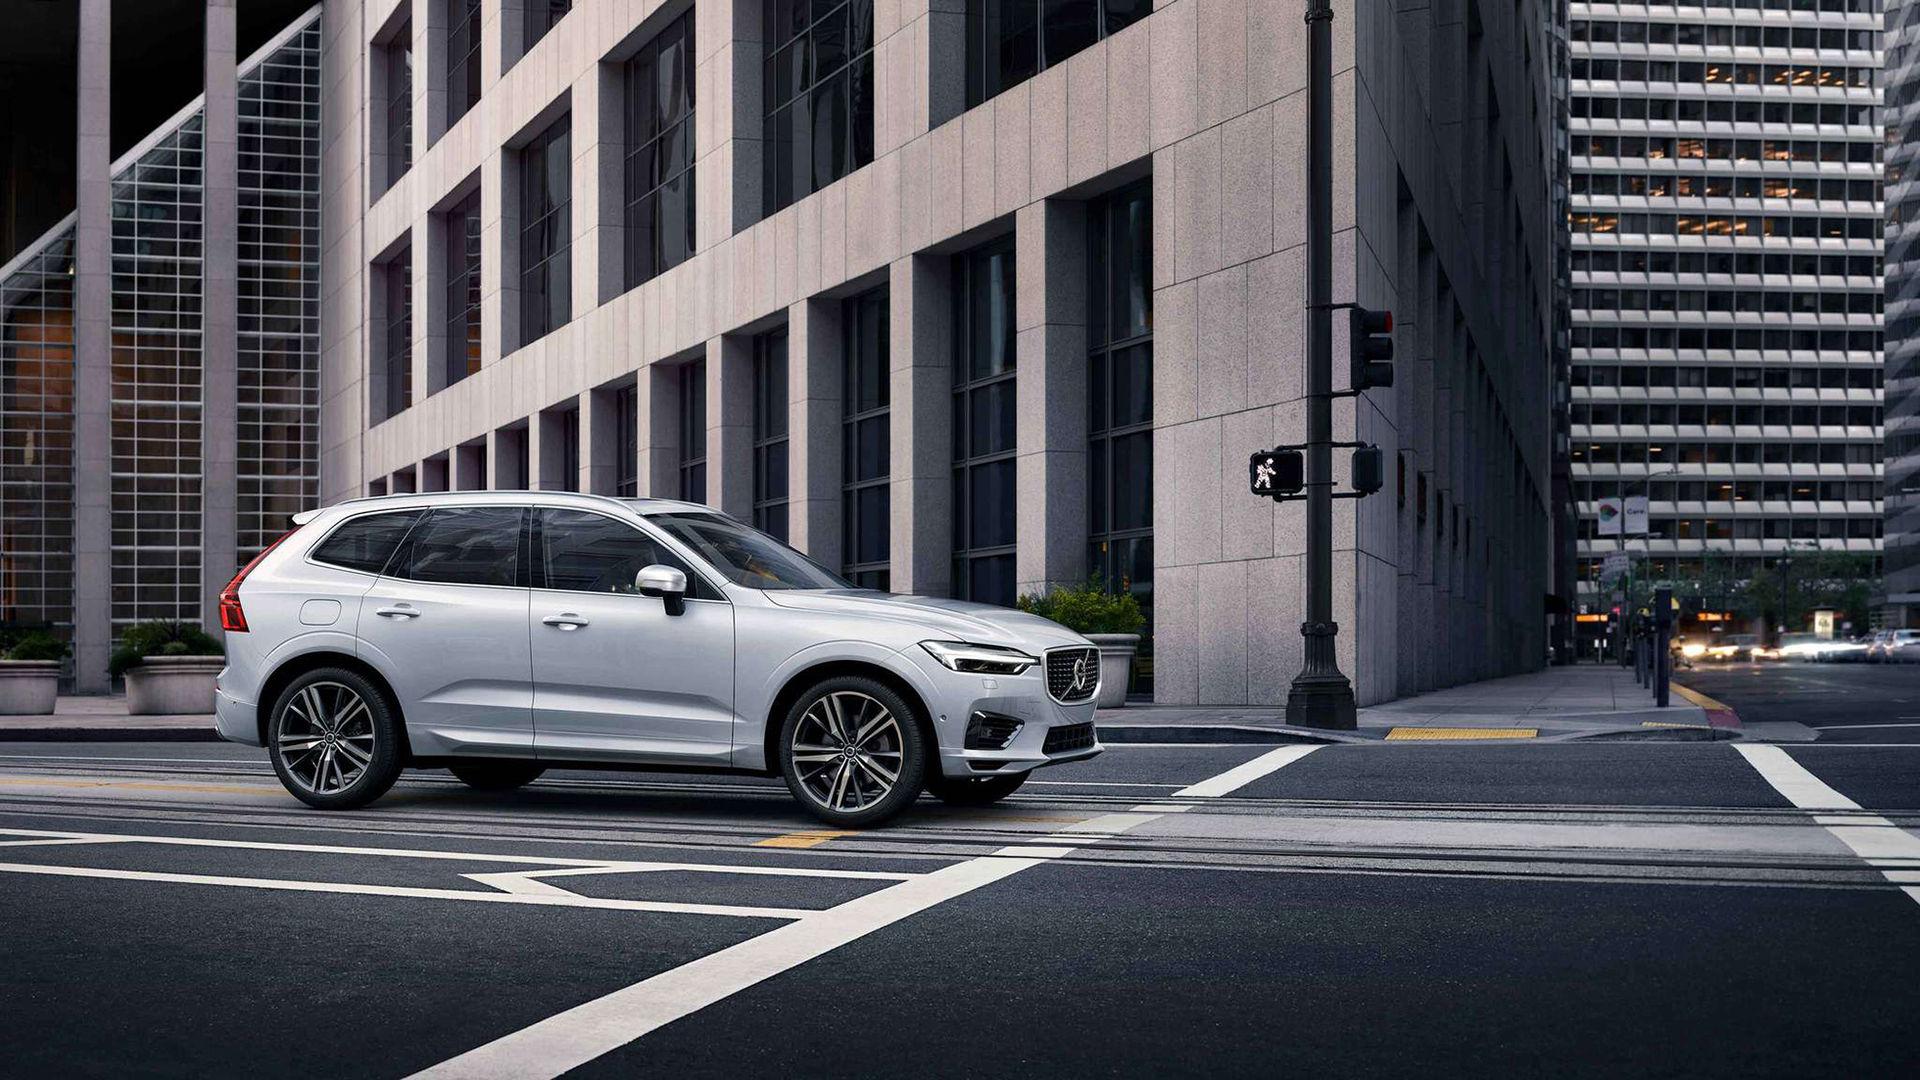 Volvo XC60 kammade även hem World Car of the Year